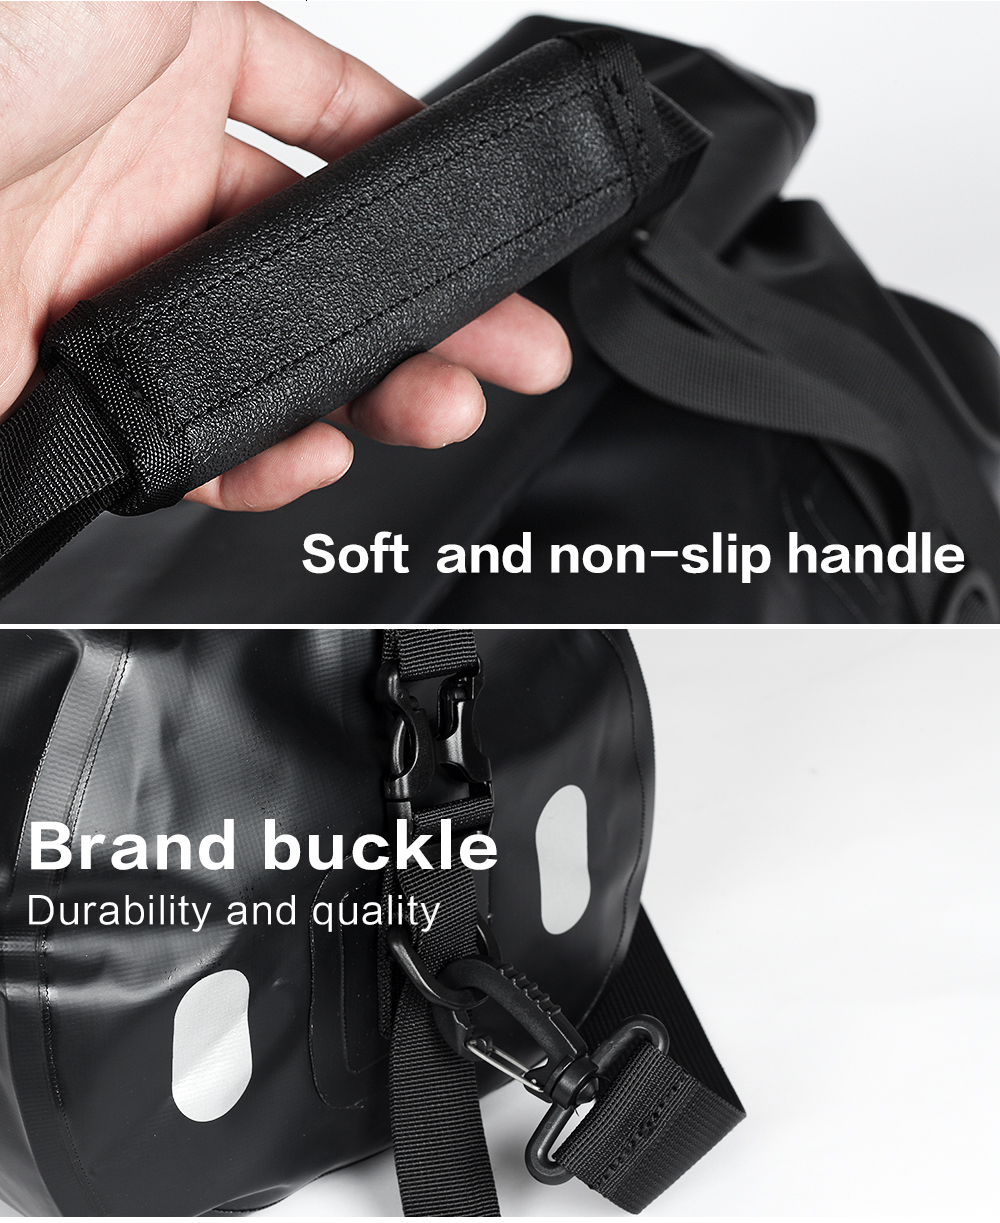 Rhinowalk Bicycle Luggage Bags 20L Full Waterproof for Road Bike Rear Rack Trunk Cycling Saddle Storage Pannier Multi Travel Bag (16)